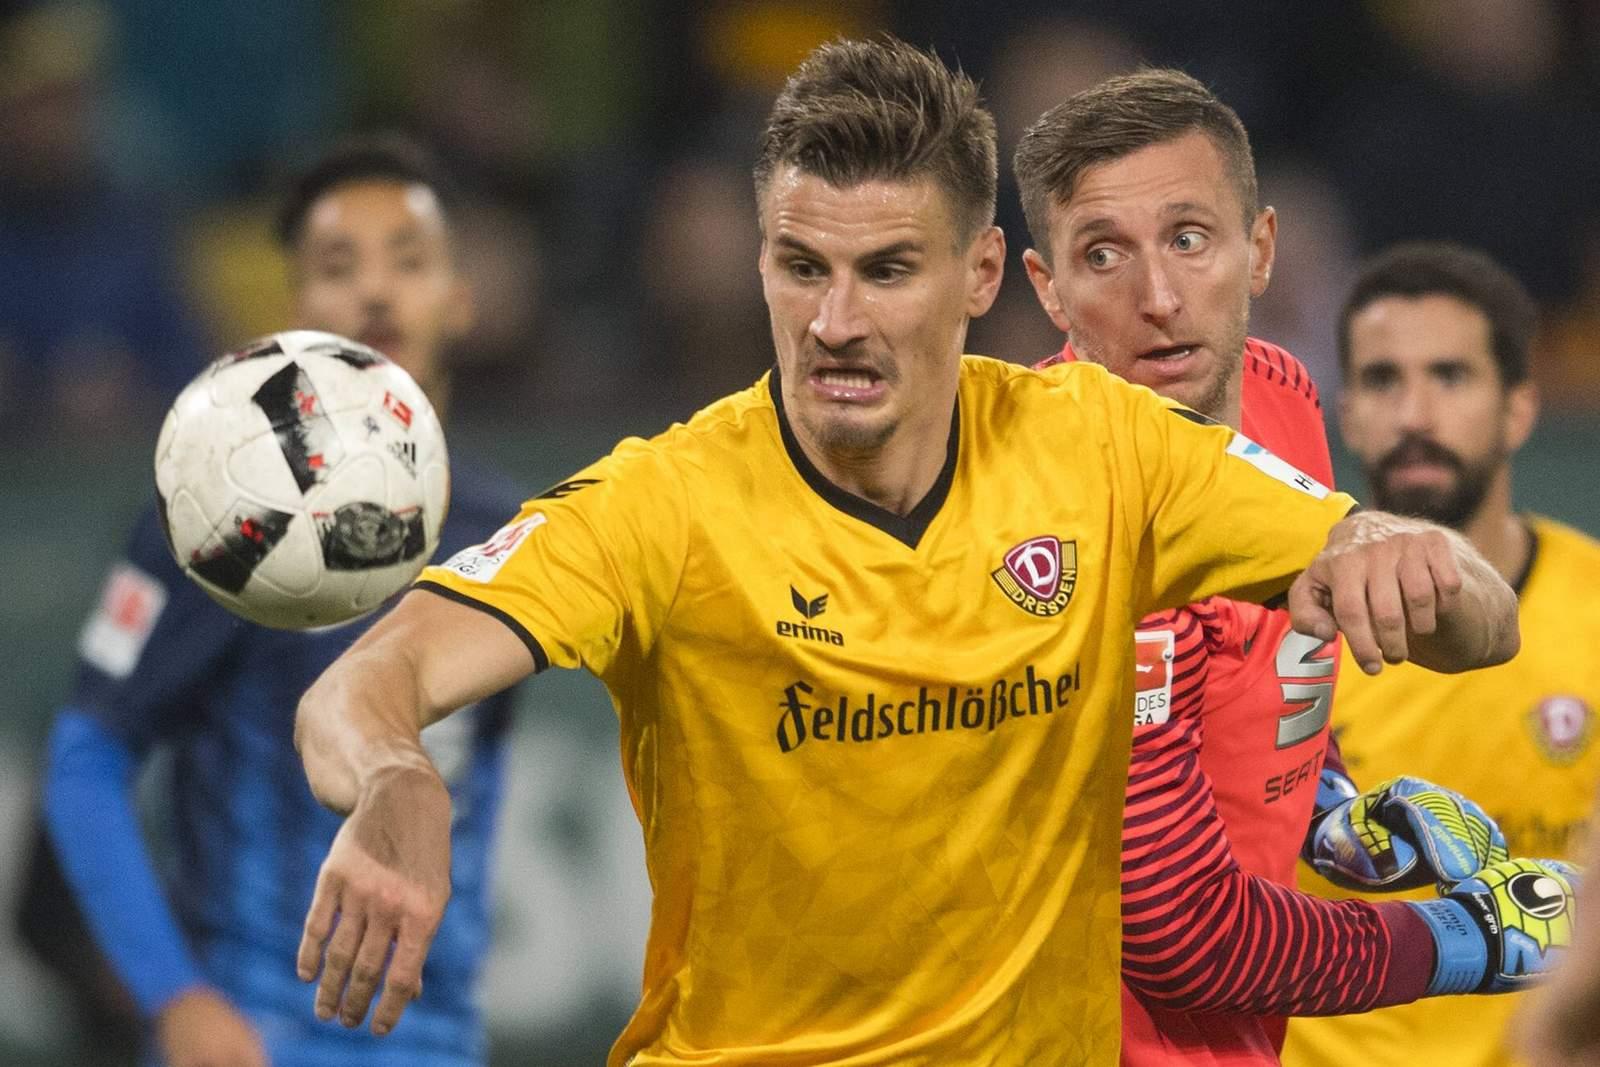 Stefan Kutschke von Dynamo Dresden